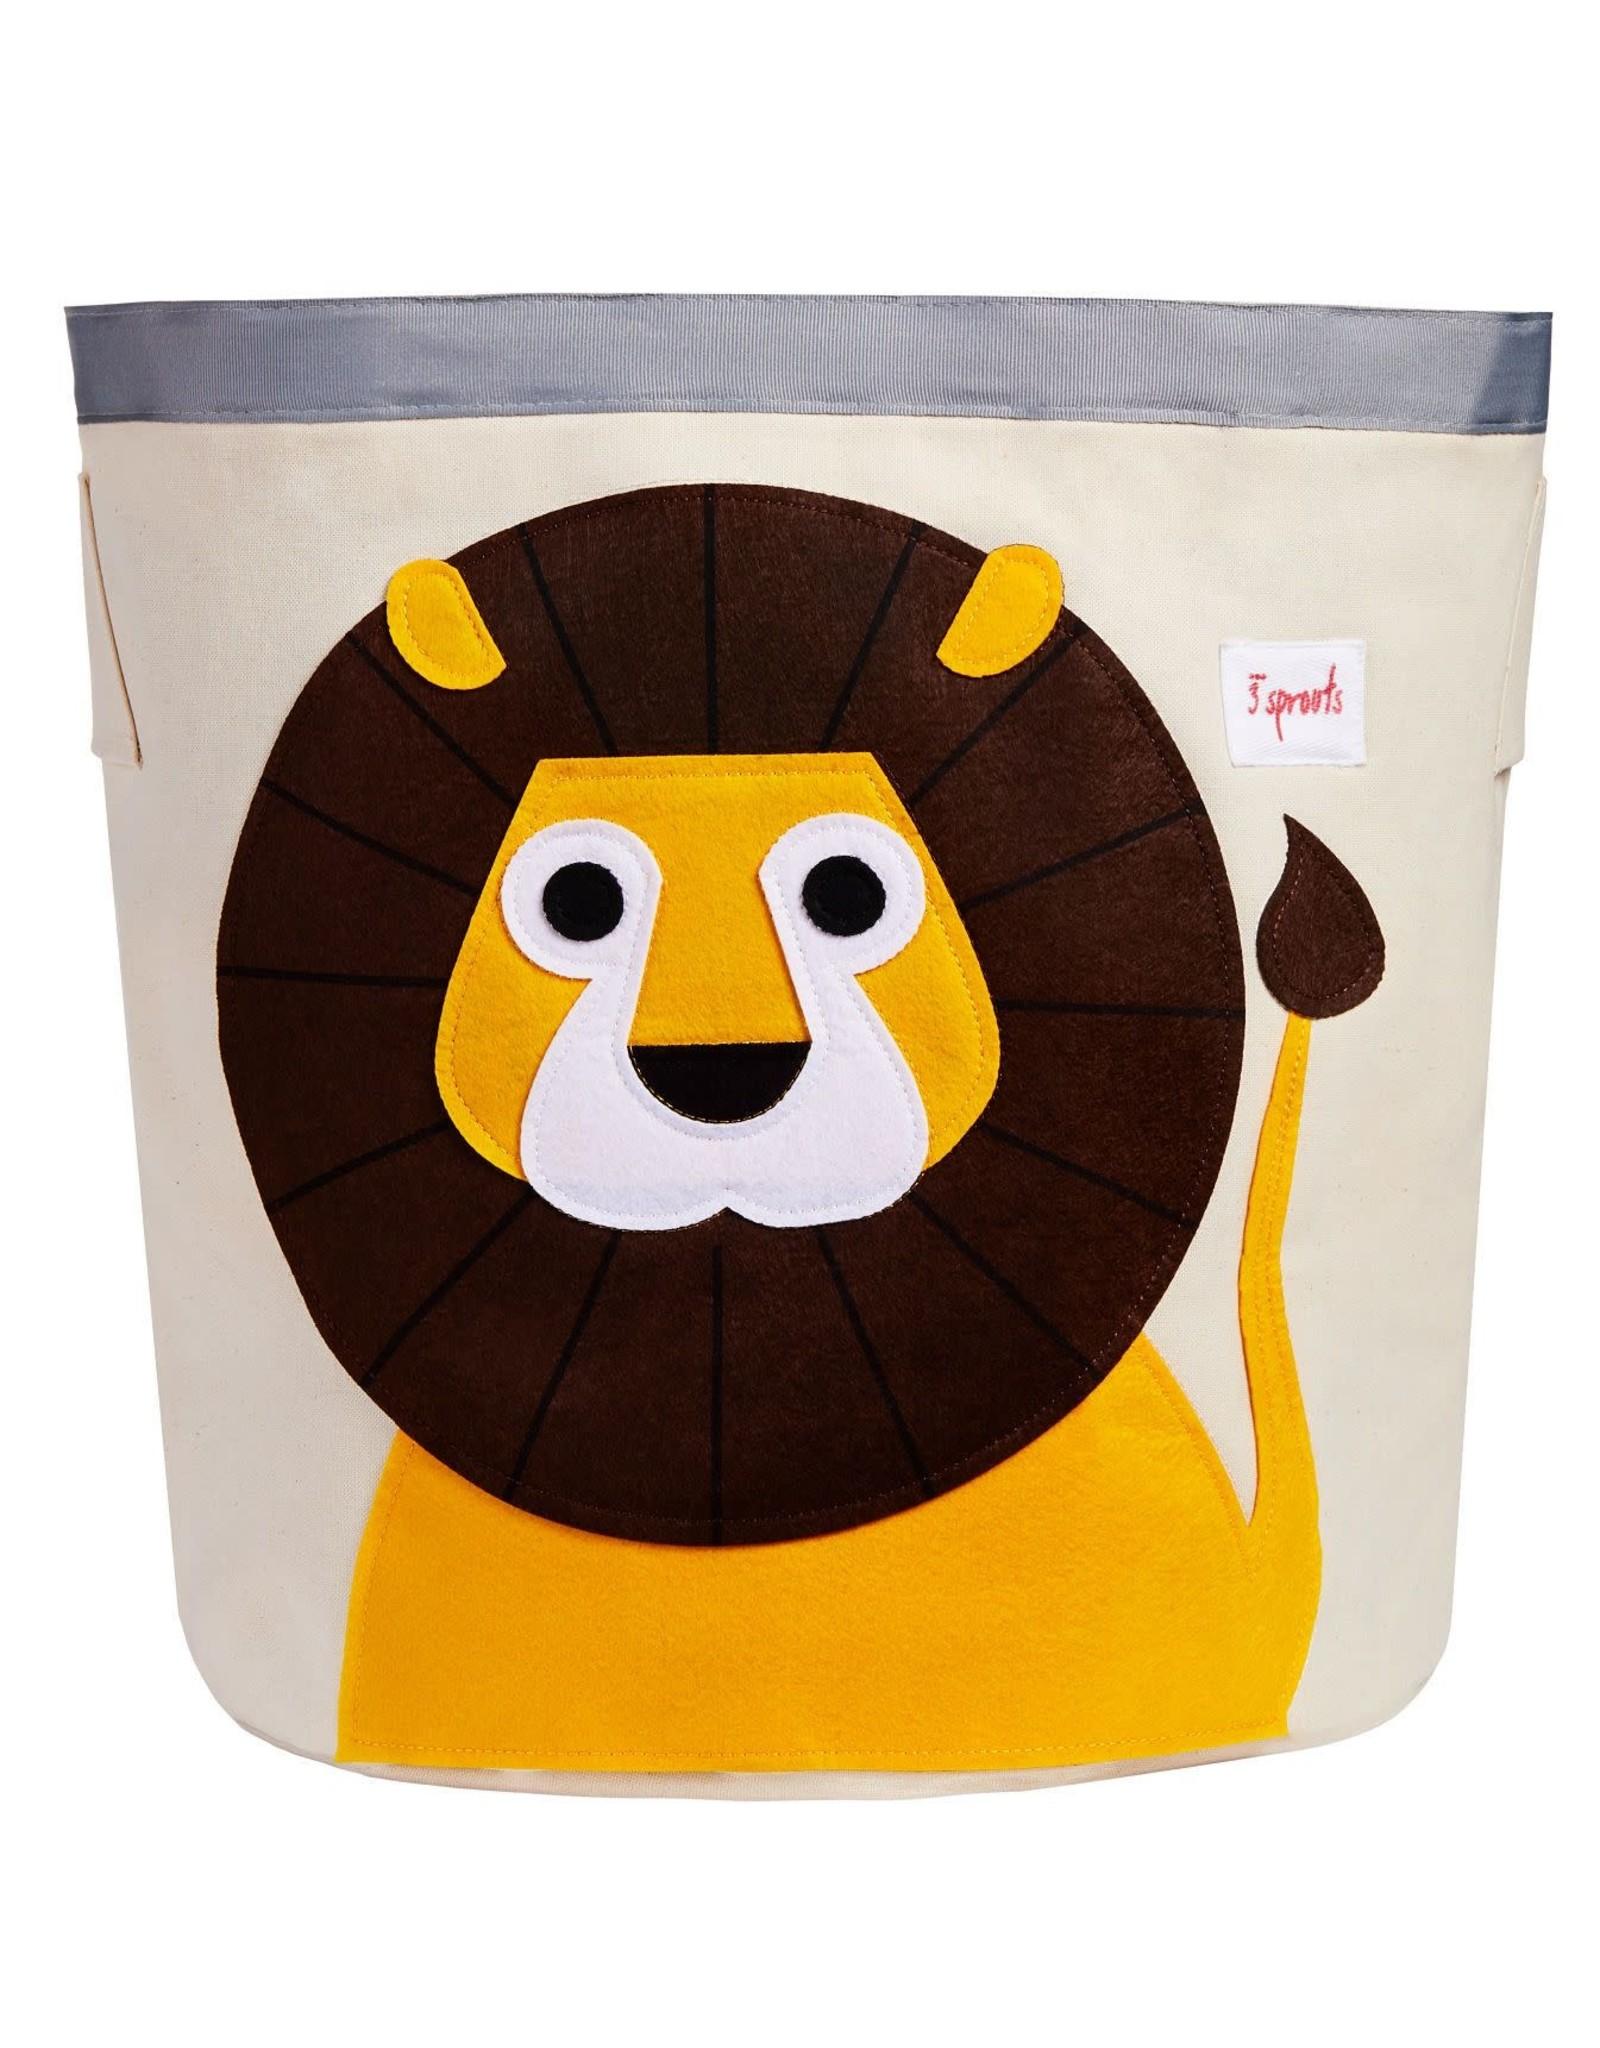 3 Sprouts Storage Bin, Yellow Lion